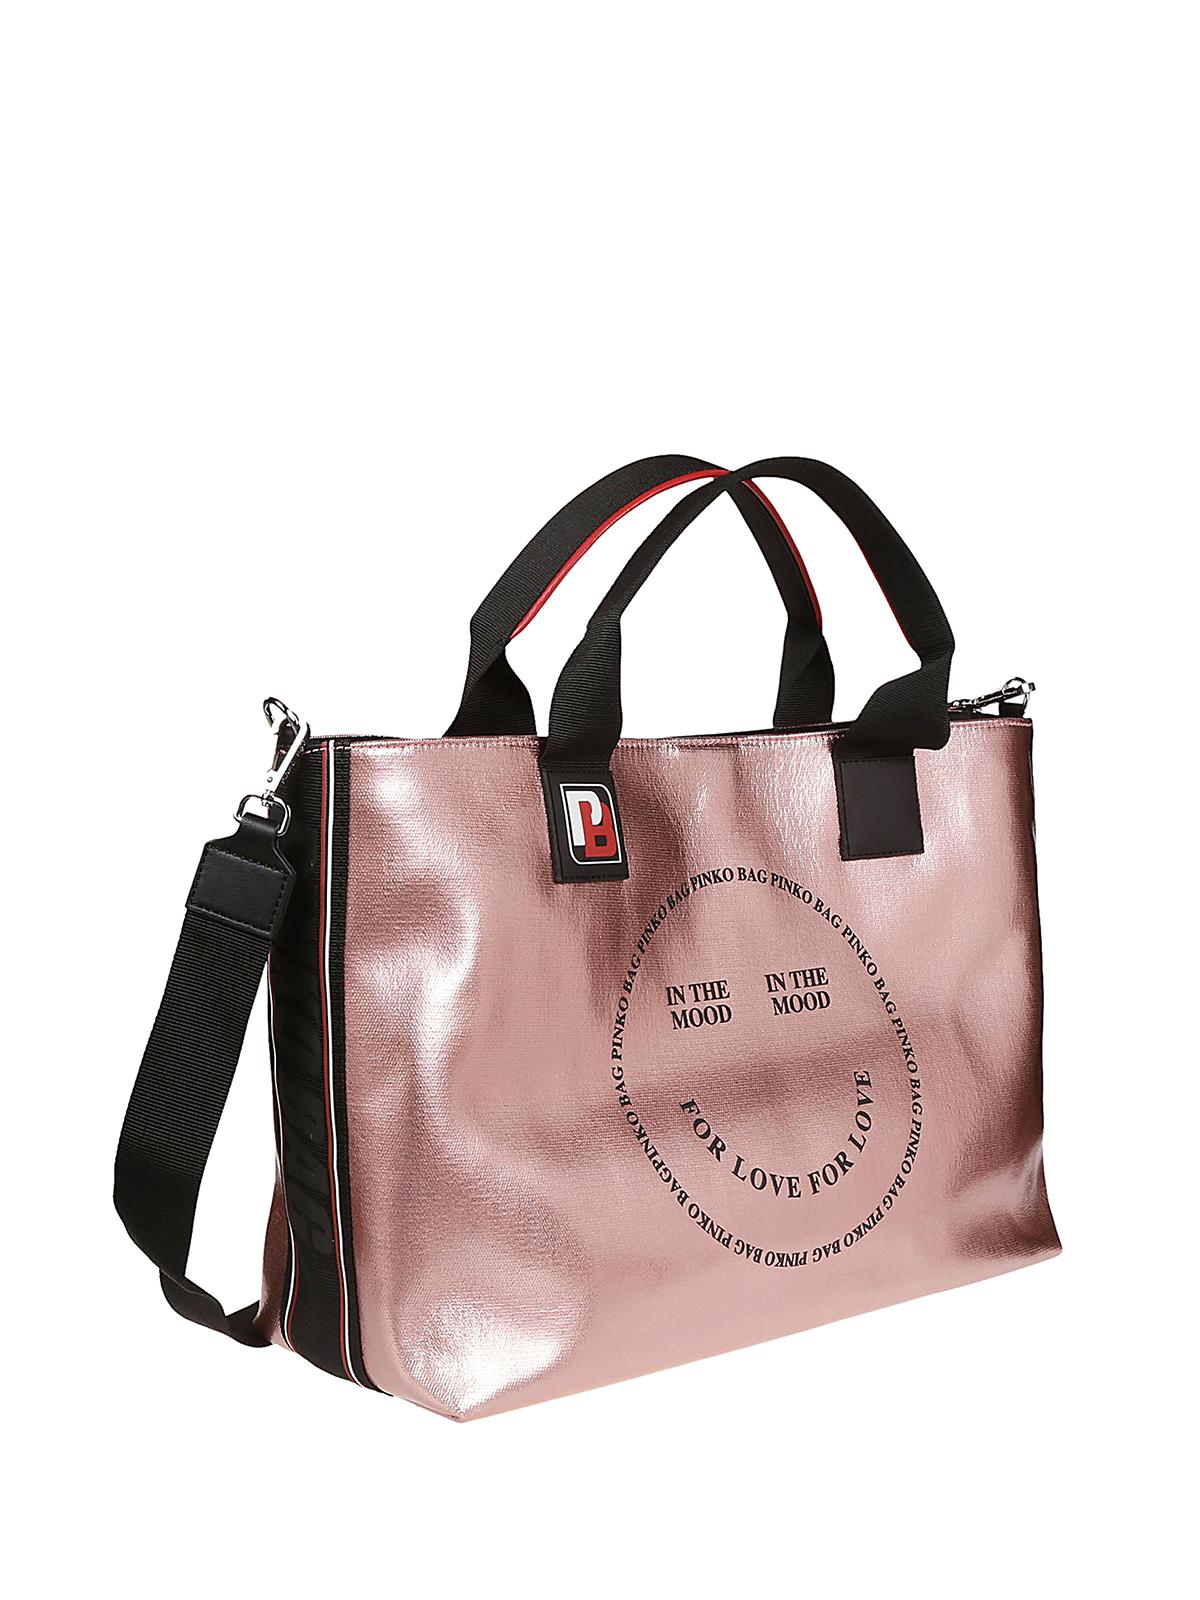 258cf2ab6e3d5 Pinko - In The Mood For Love - Rosado - Bolsos Shopping - 1H20KP ...